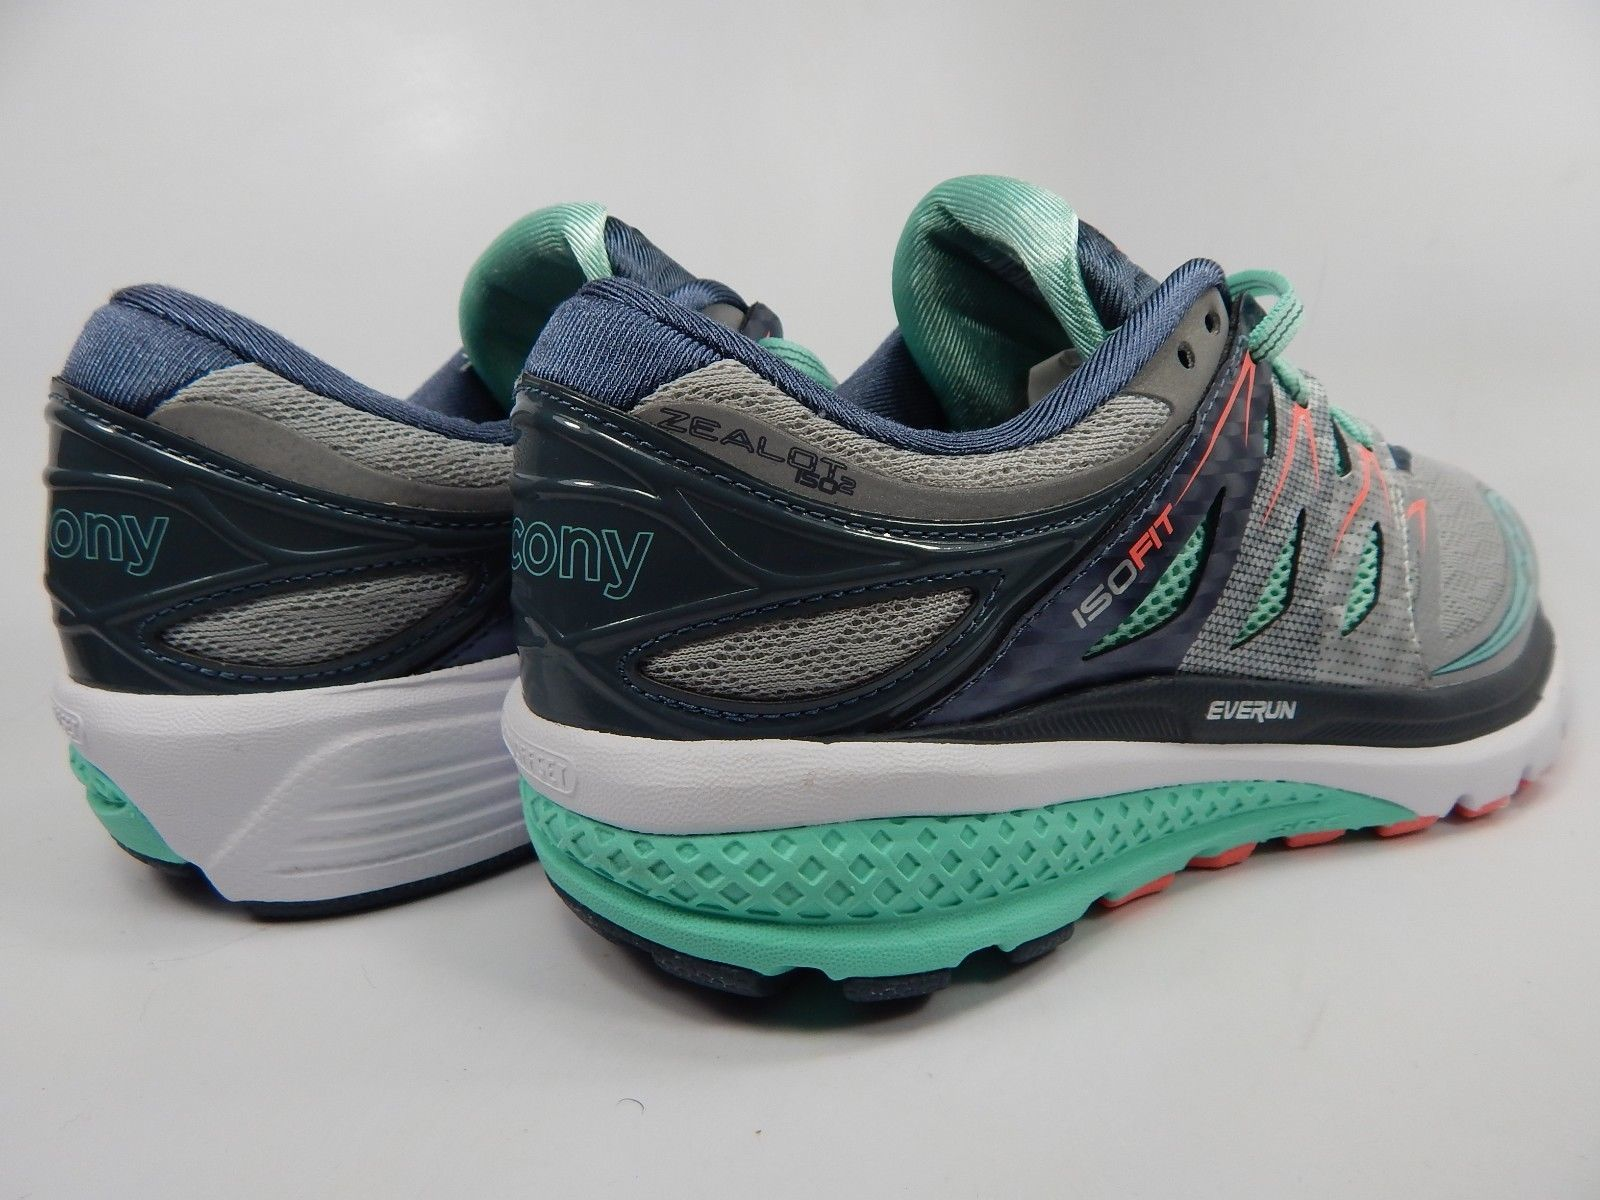 Saucony Zealot ISO 2 Running Shoes Women's Size US 9.5 M (B) EU 41 S10314-1